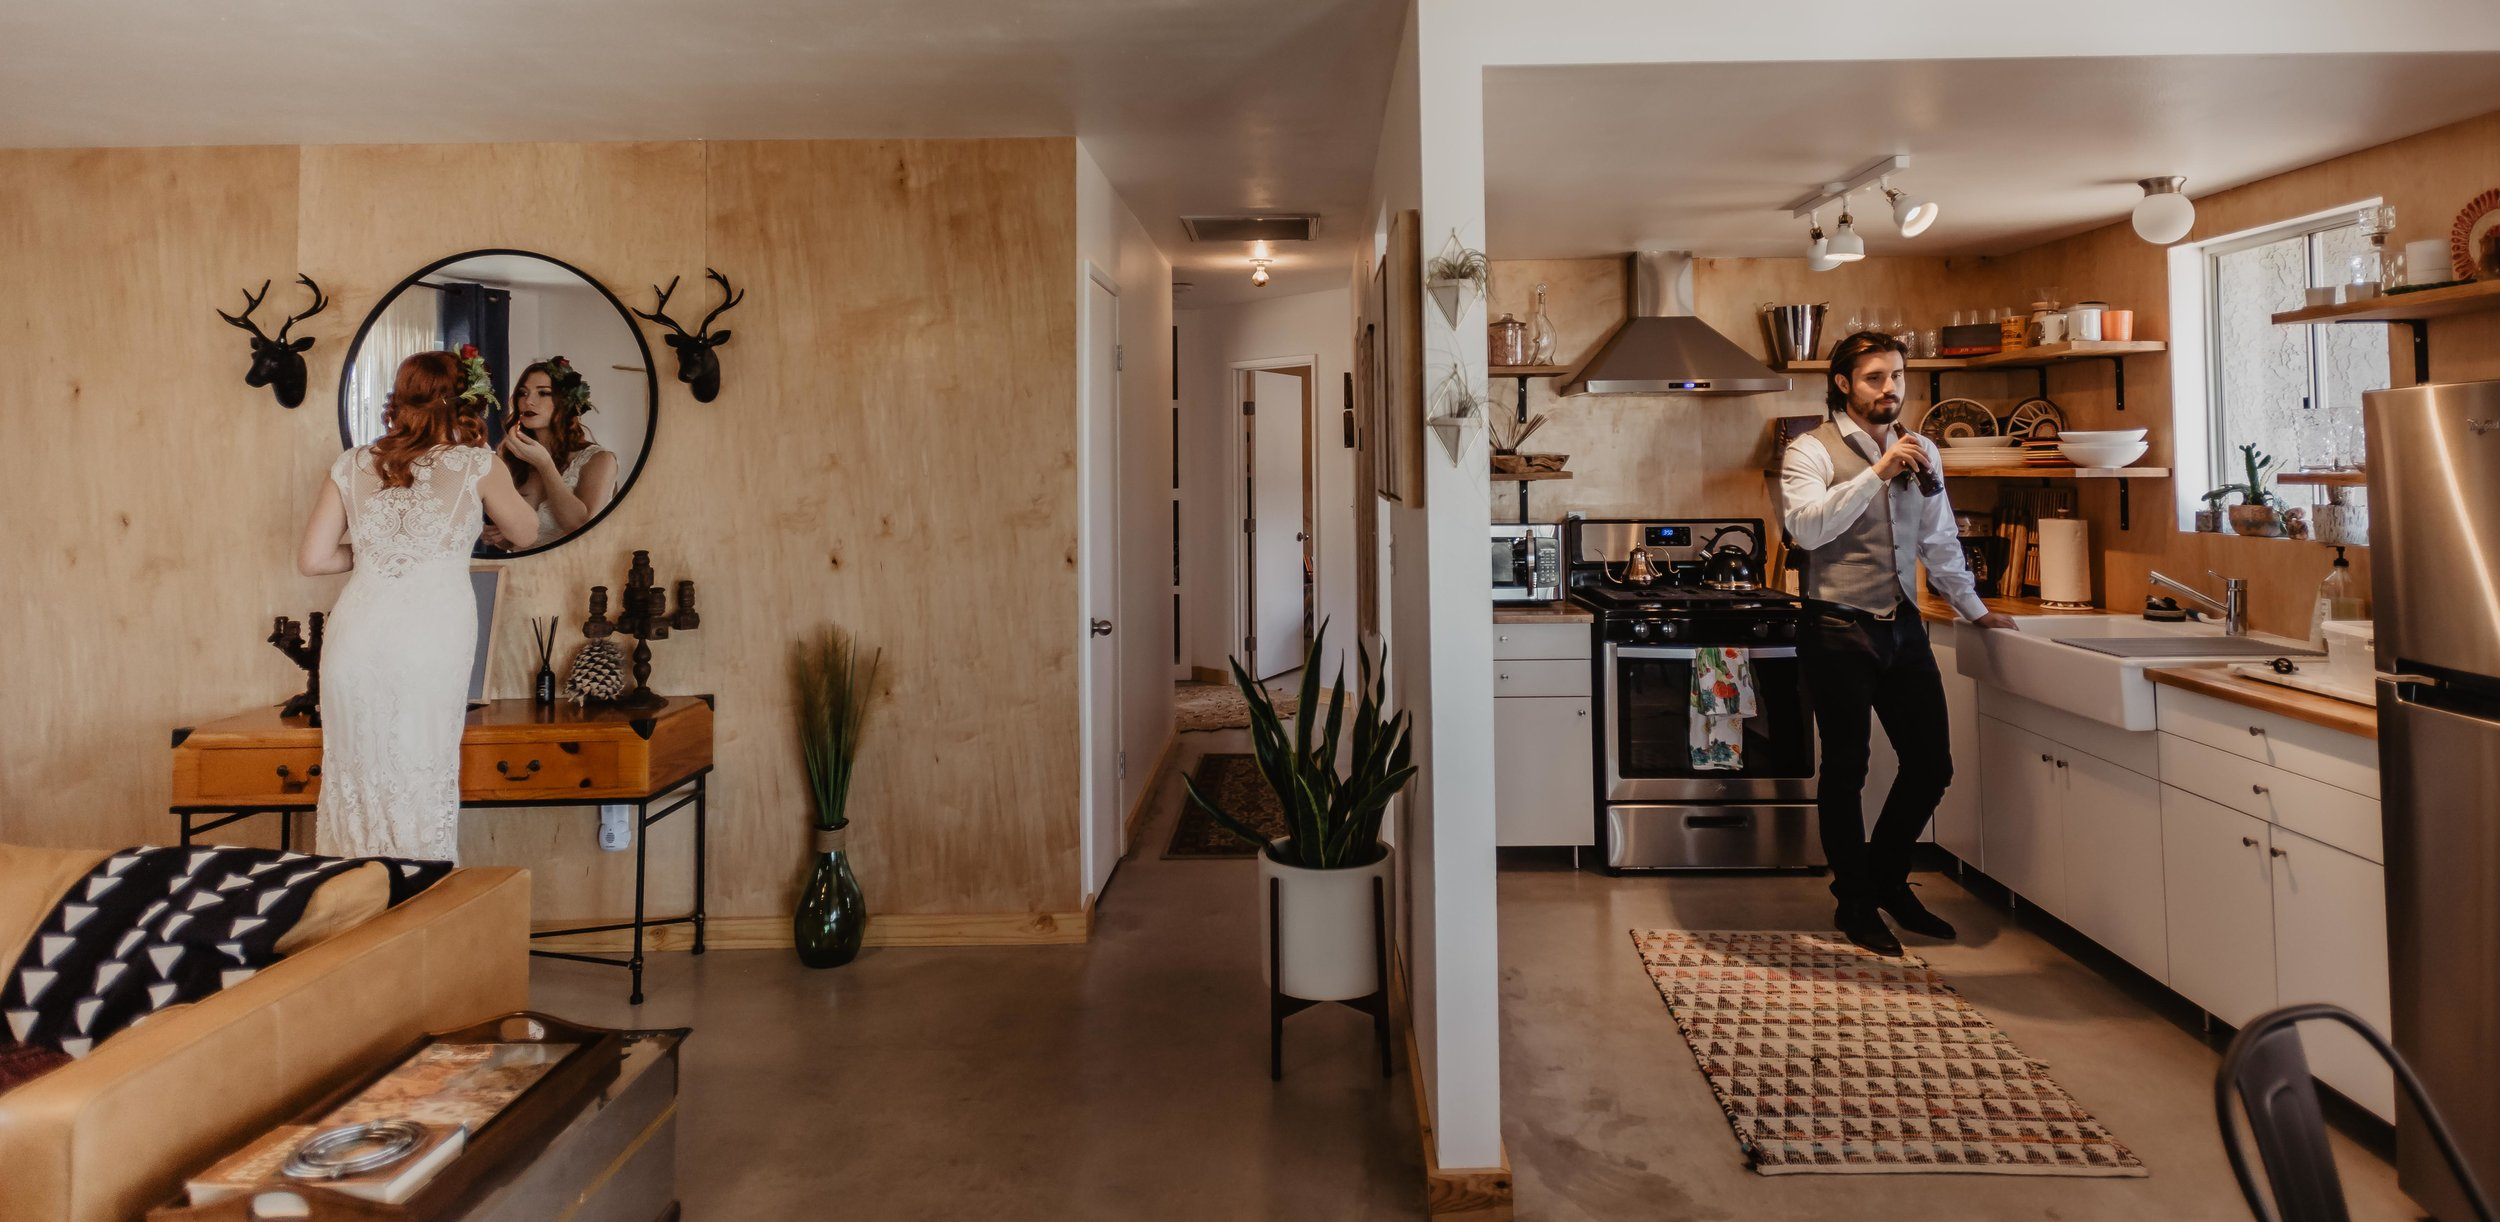 Arizona Elopement Photographer - Joshua Tree Airbnb